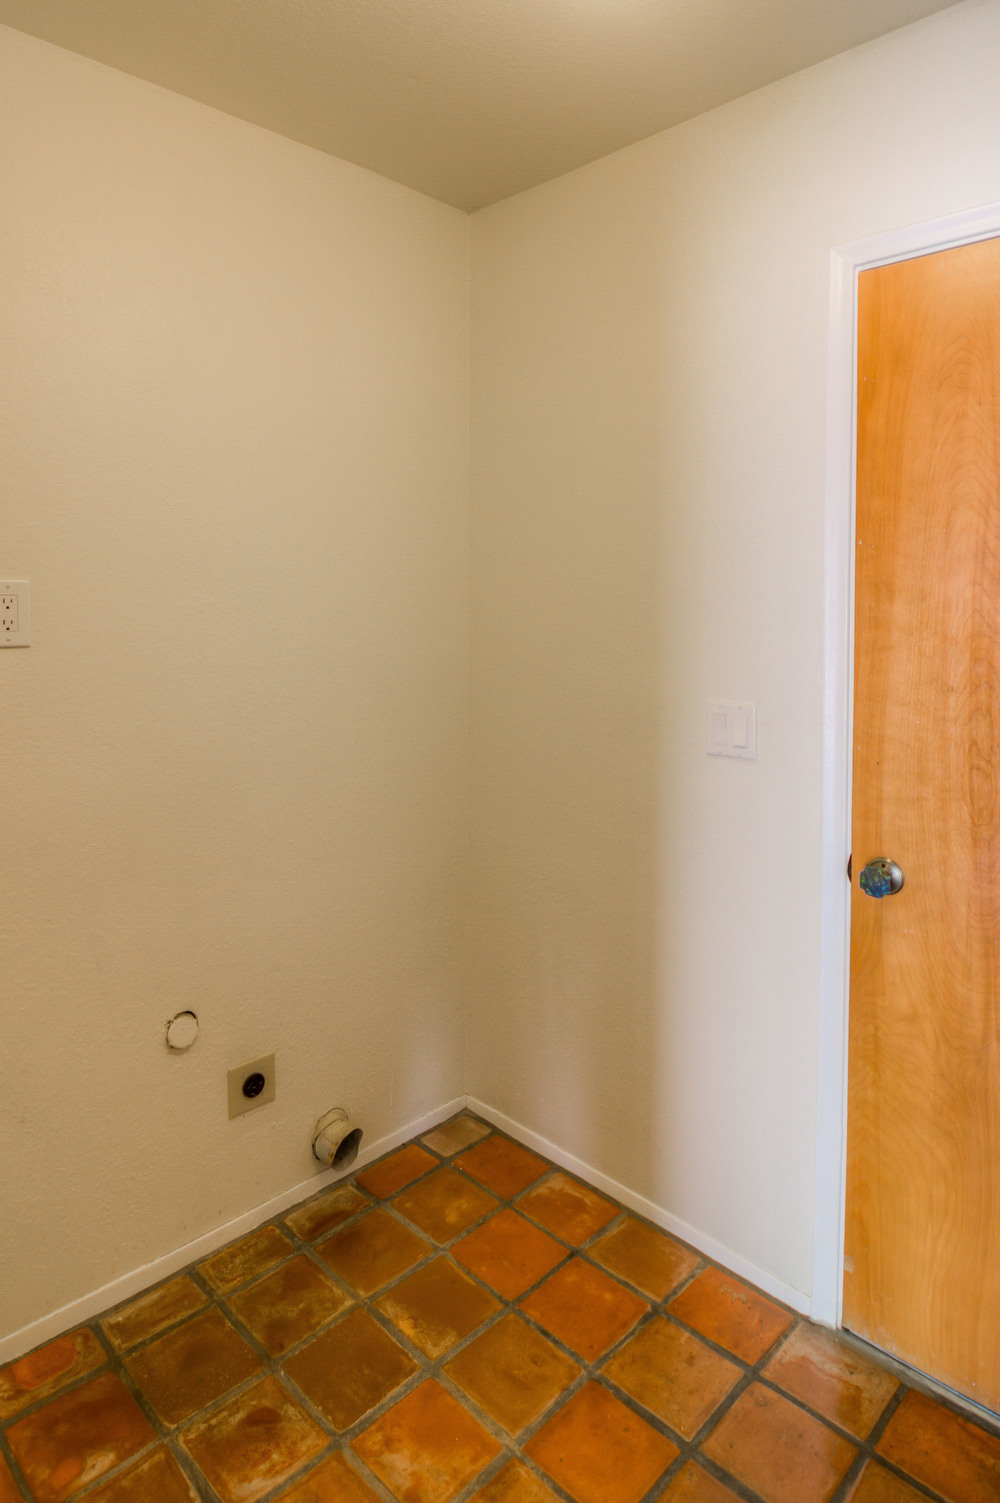 15 Laudnry Room photo b.jpg